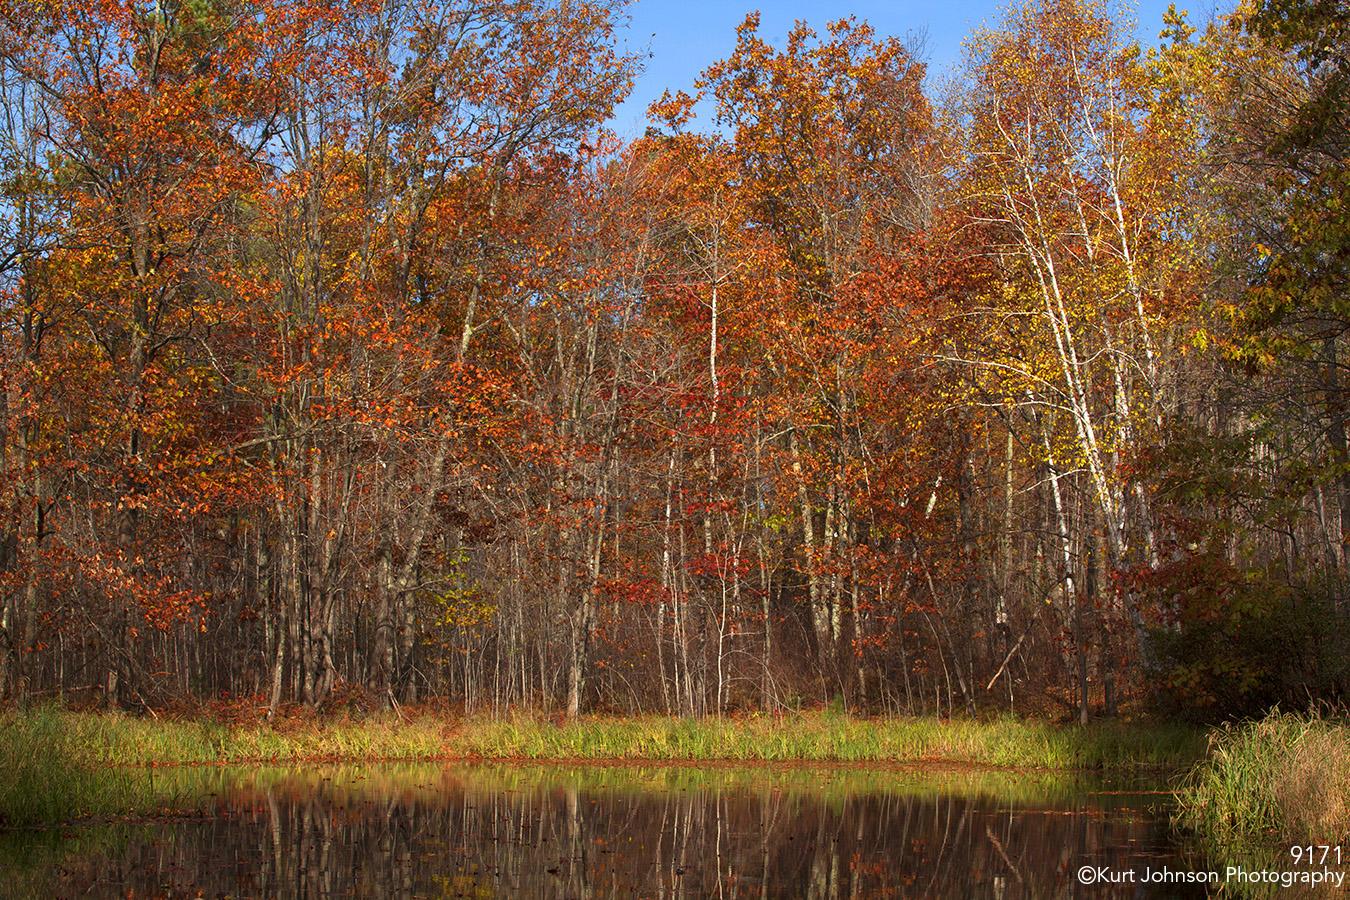 landscape trees water pond fall color birch red orange minnesota grasses